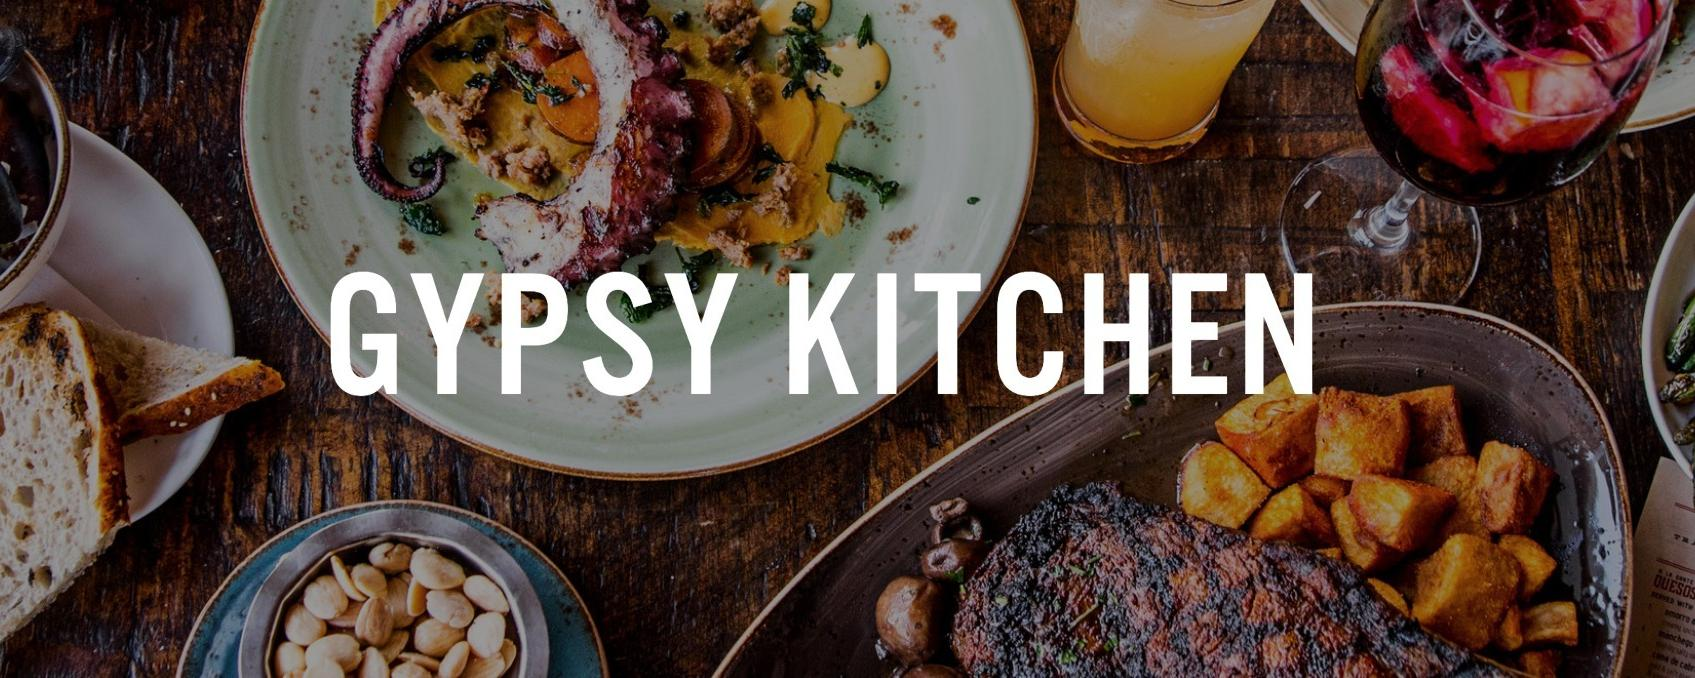 Gypsy Kitchen Brand Cover